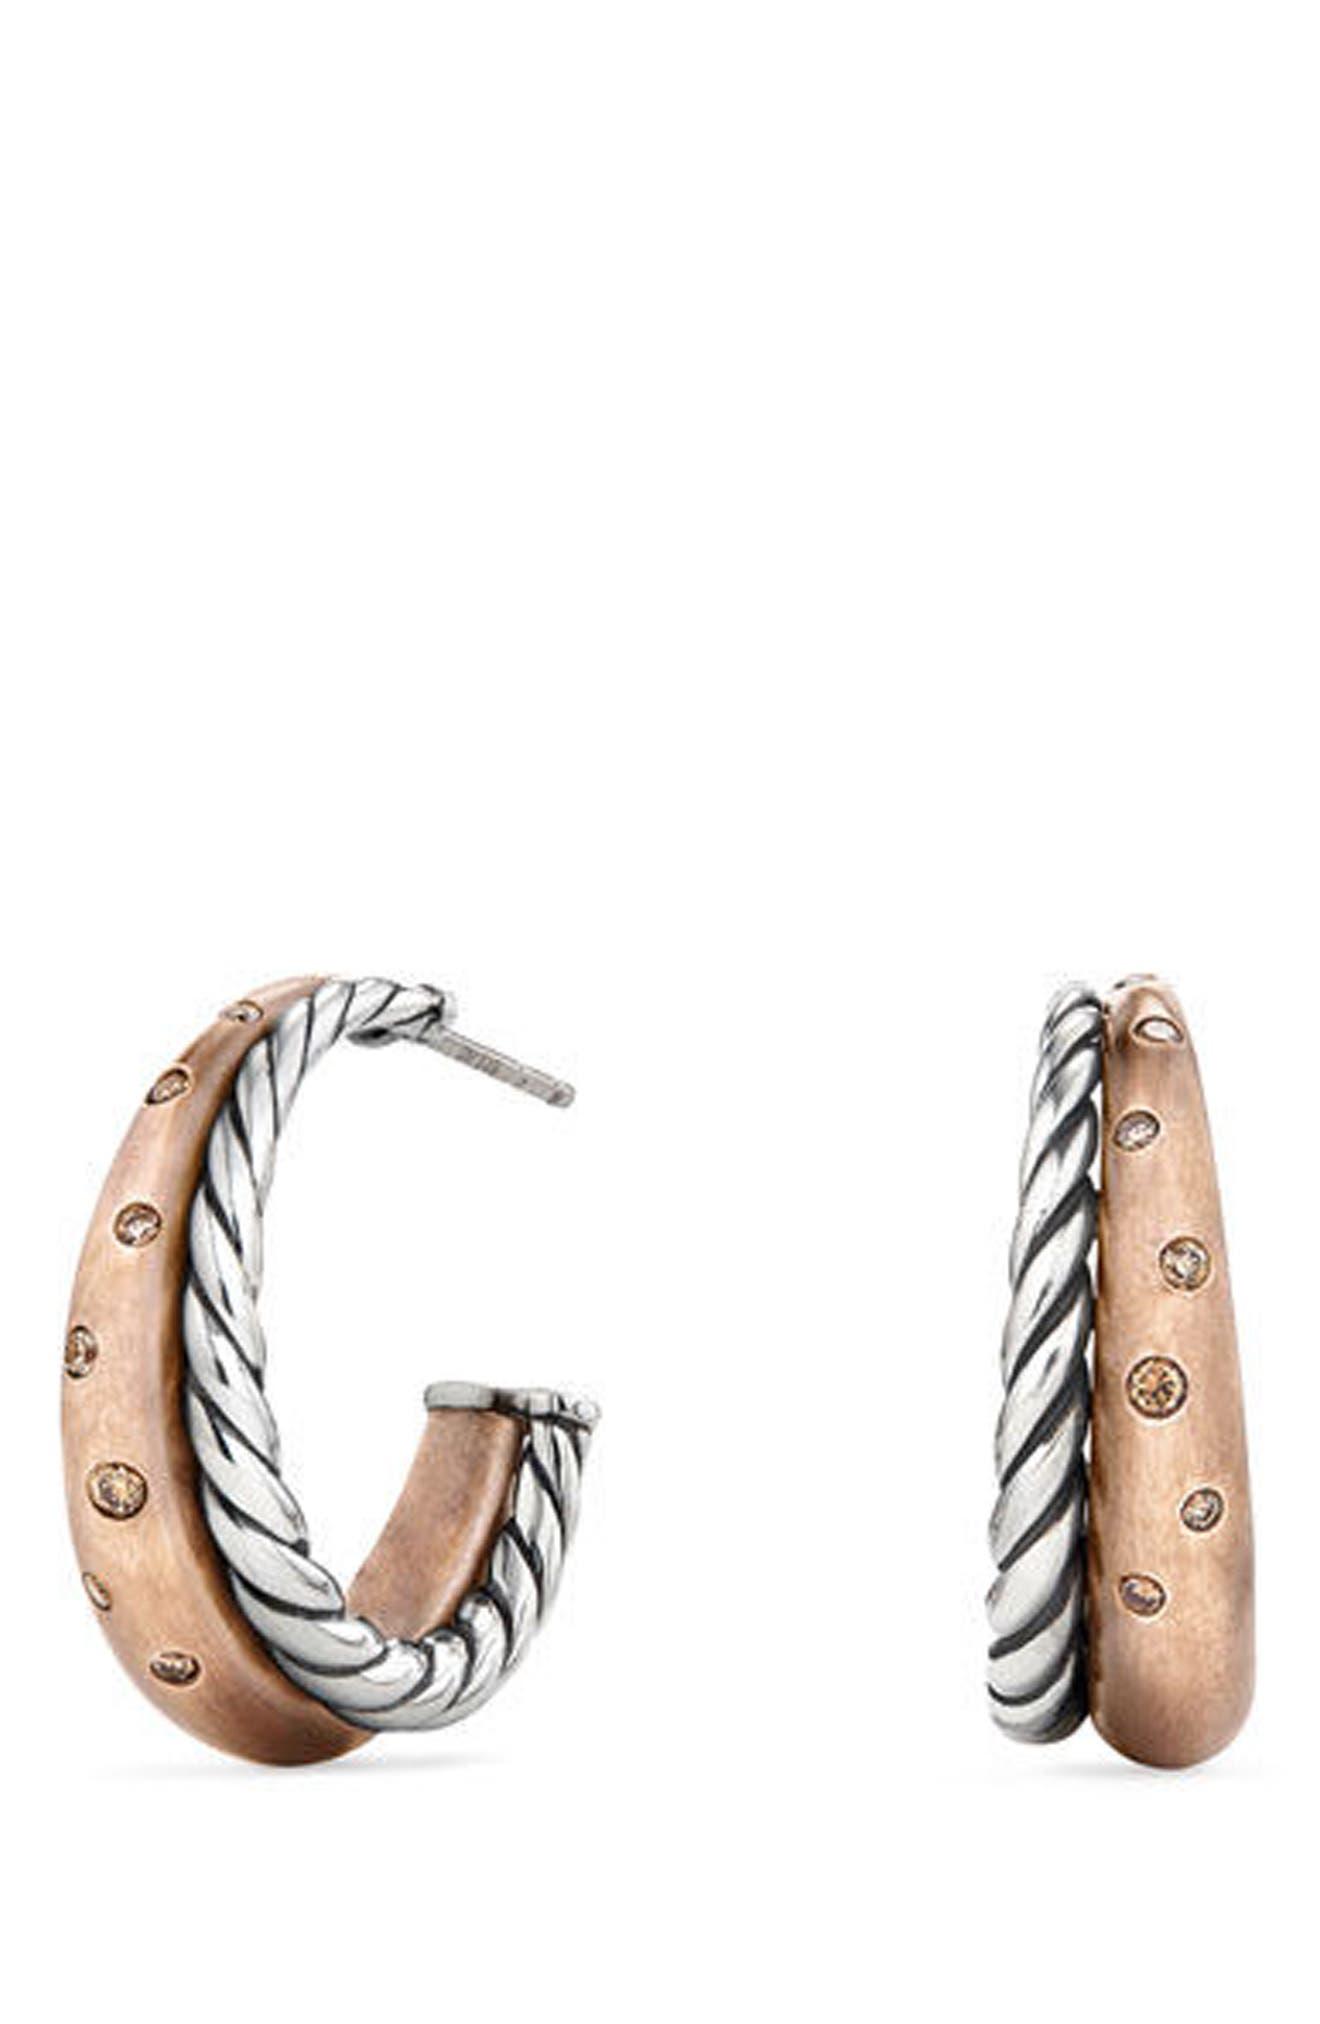 Alternate Image 1 Selected - David Yurman Pure Form Mixed Metal Hoop Earrings with Diamonds, Bronze & Silver, 26.5mm